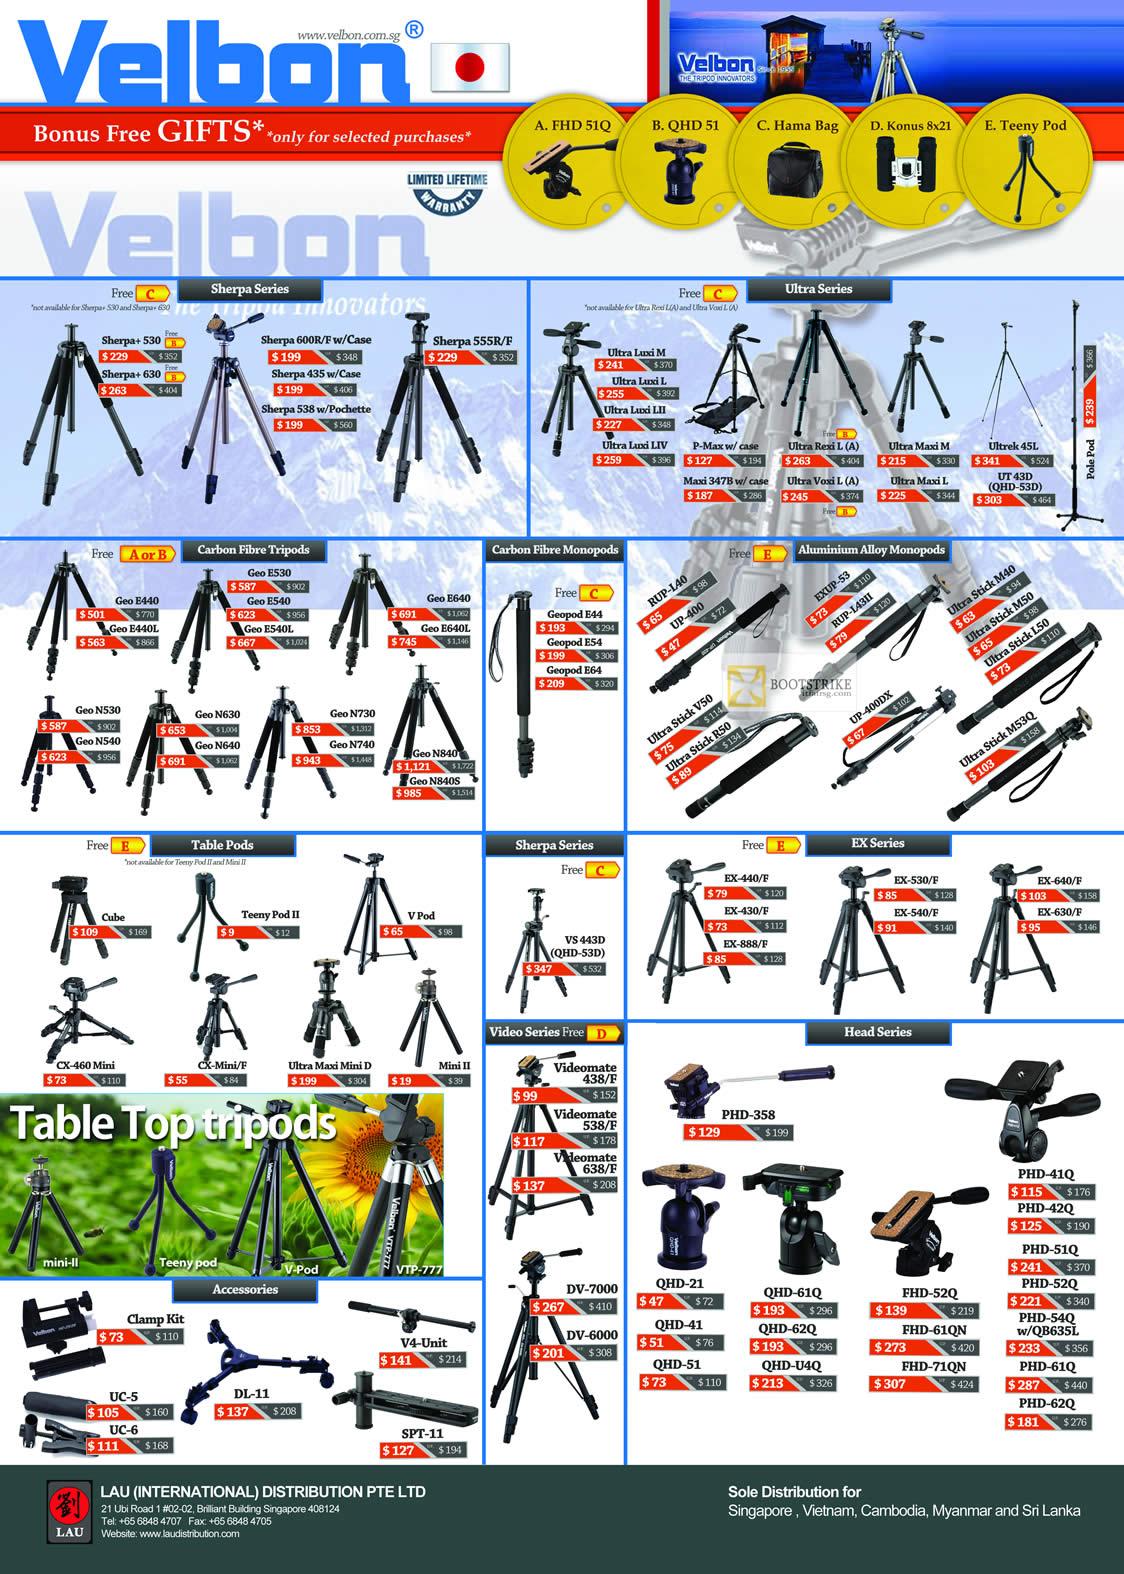 IT SHOW 2012 price list image brochure of Lau Intl Velbon Tripods, Sherpa, Ultra, Carbon Fibre, Aluminium Alloy Monopods, Table, EX, Head, Table Top